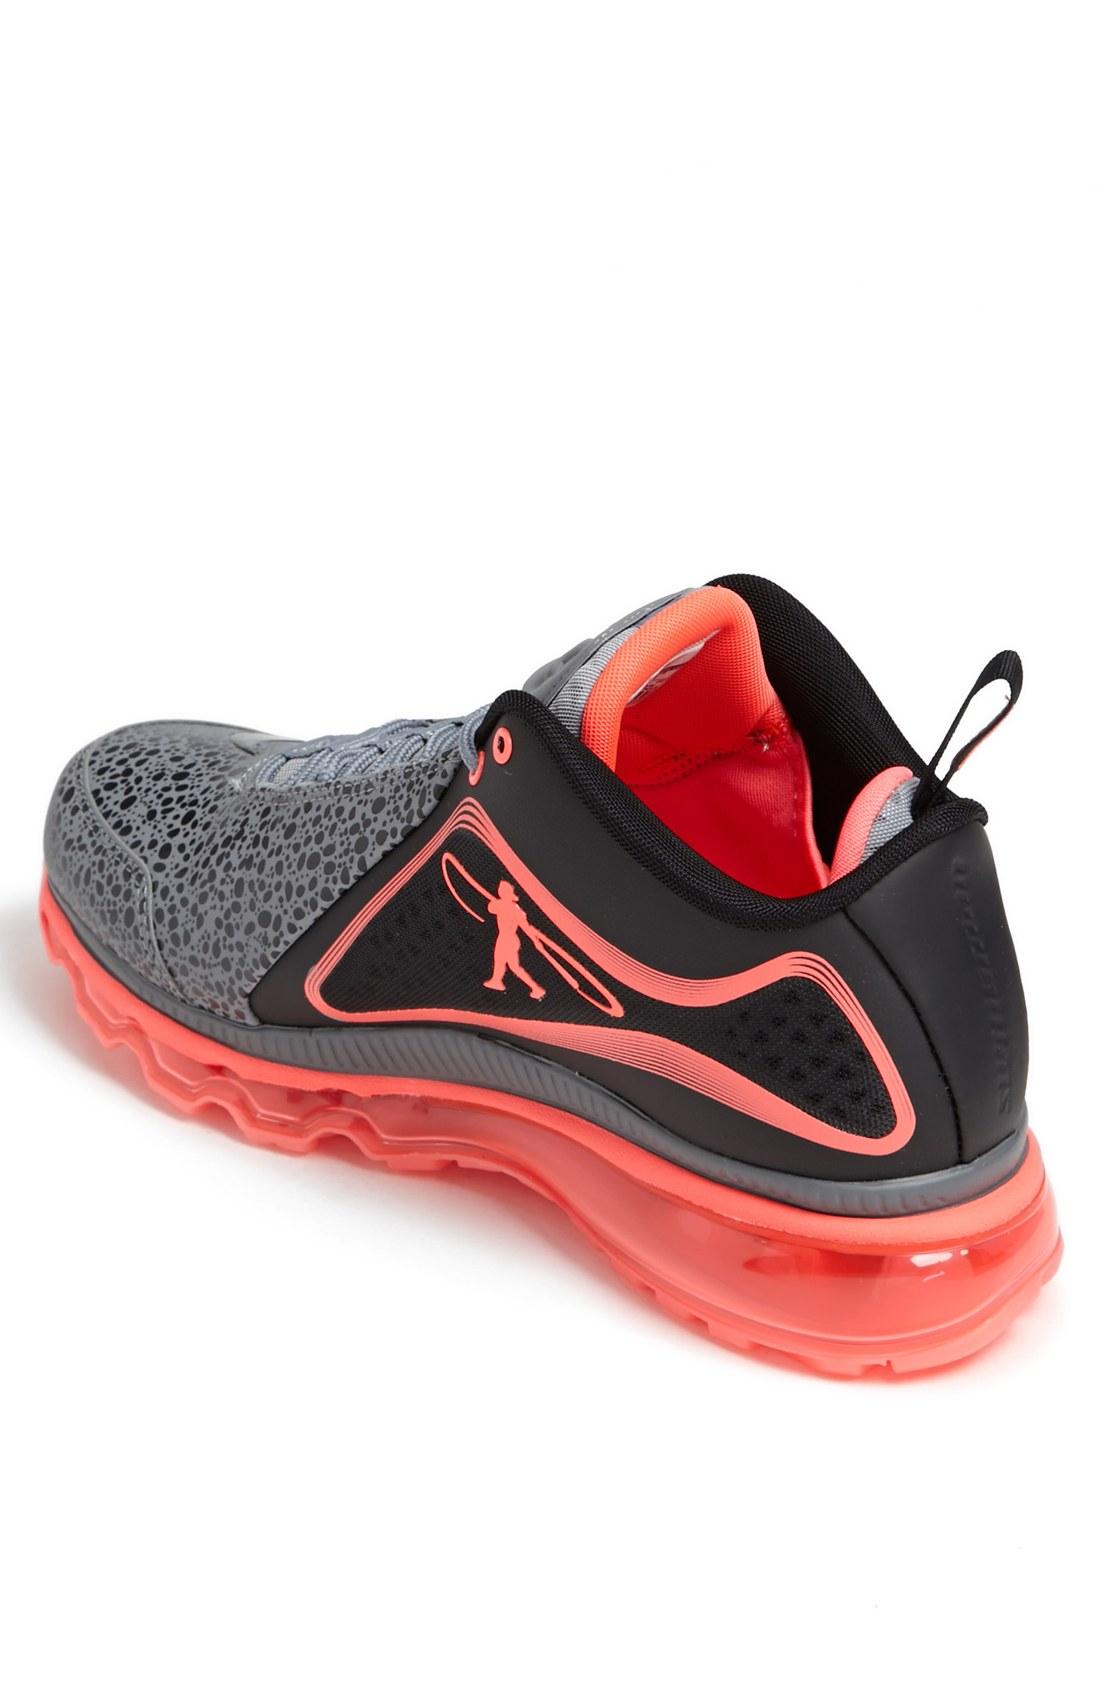 nike men\u0026#39;s air griffey max 360 training shoes